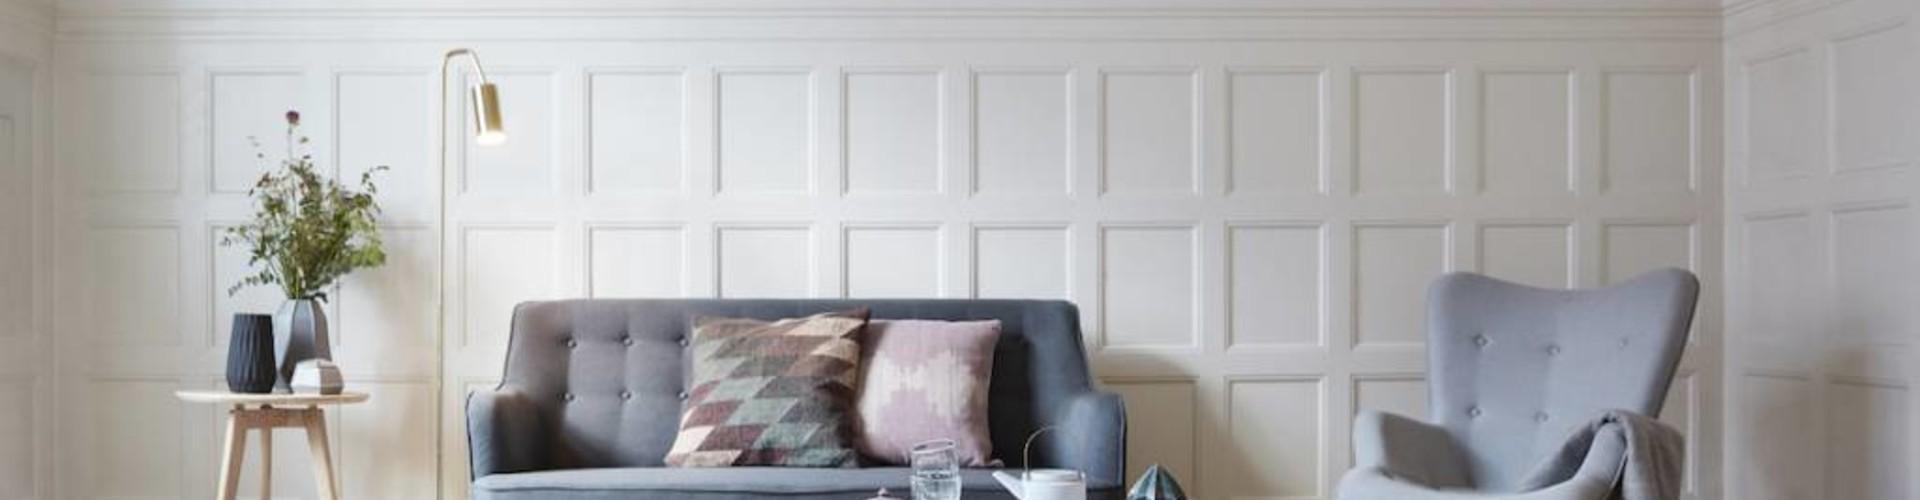 Mooie en duurzame woonkamer meubels bestellen